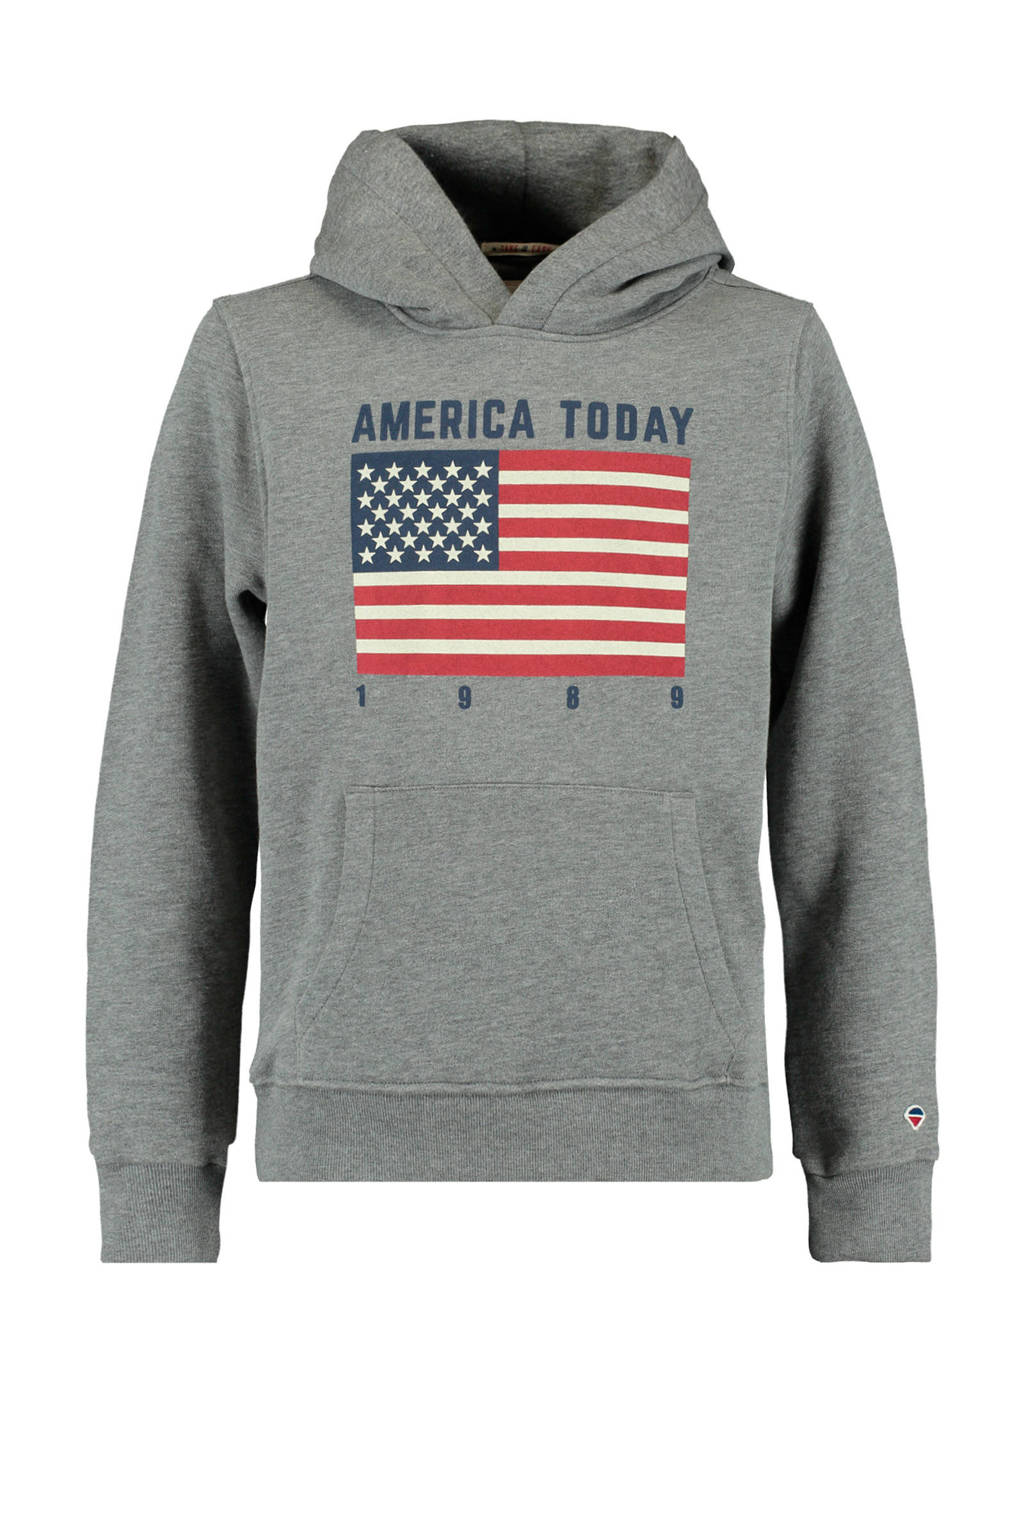 America Today Junior hoodie Sol met printopdruk grijs melange/donkerblauw/rood, Grijs melange/donkerblauw/rood